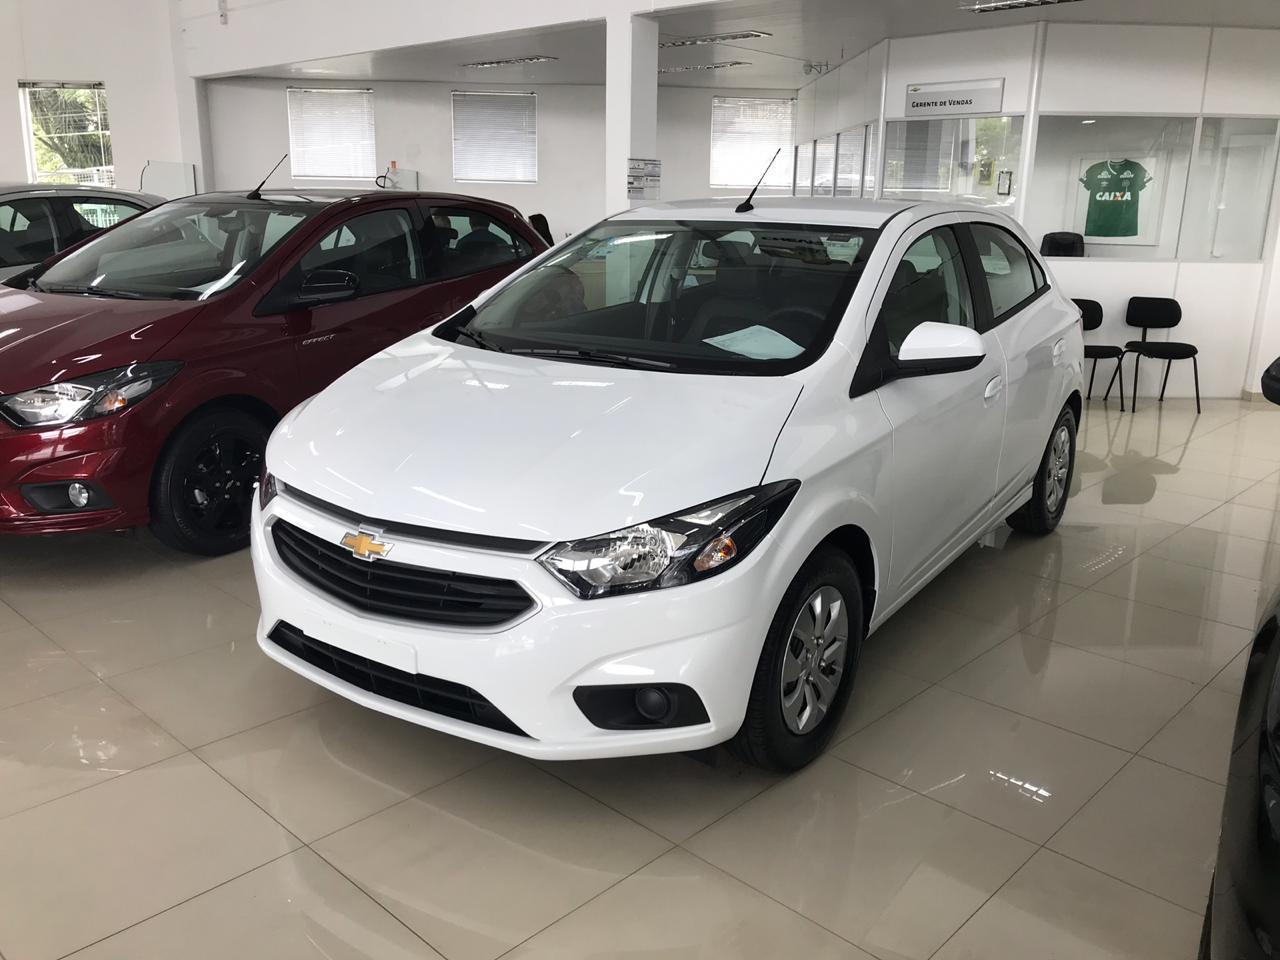 Chevrolet ONIX 1.0 MT LT ZERO KM 1.0 2019